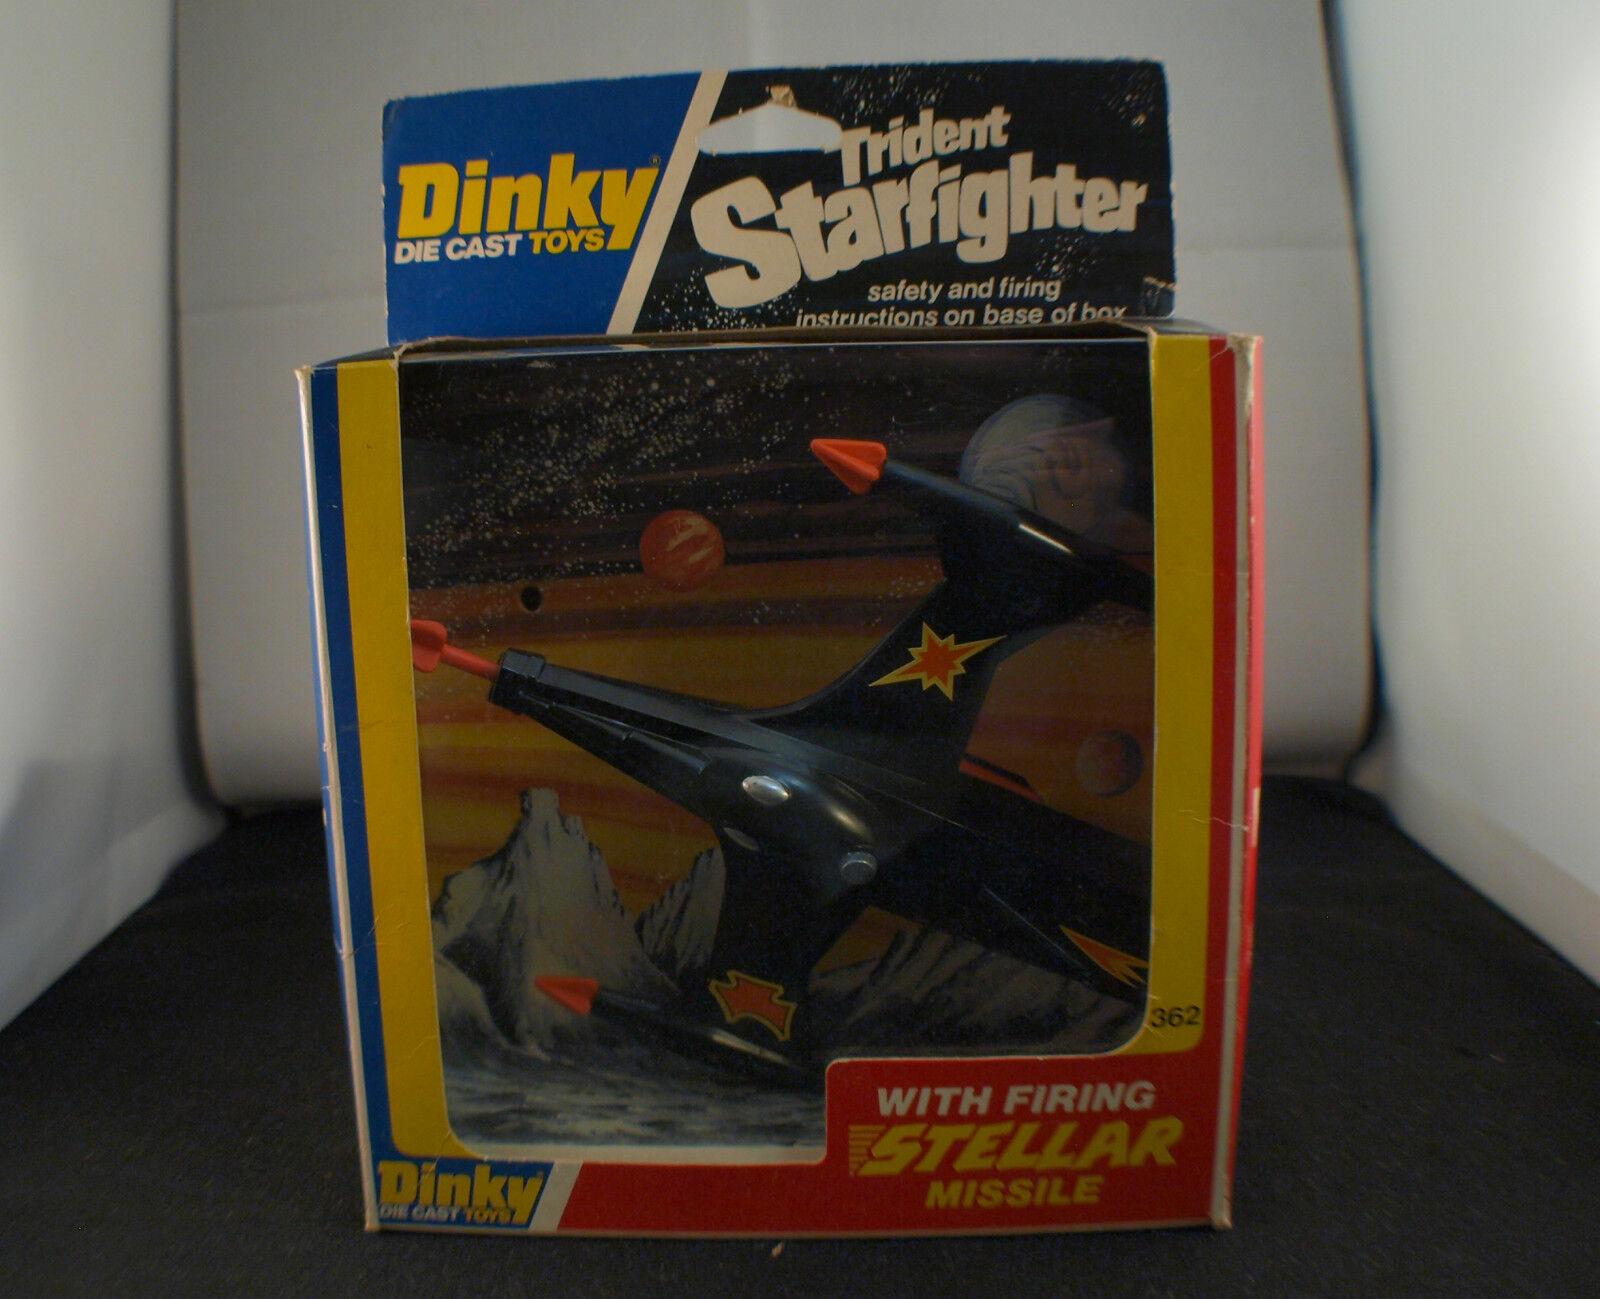 Dinky Toys GB 362 avion Trident starfighter with stellar missile neuf  MIB RARE